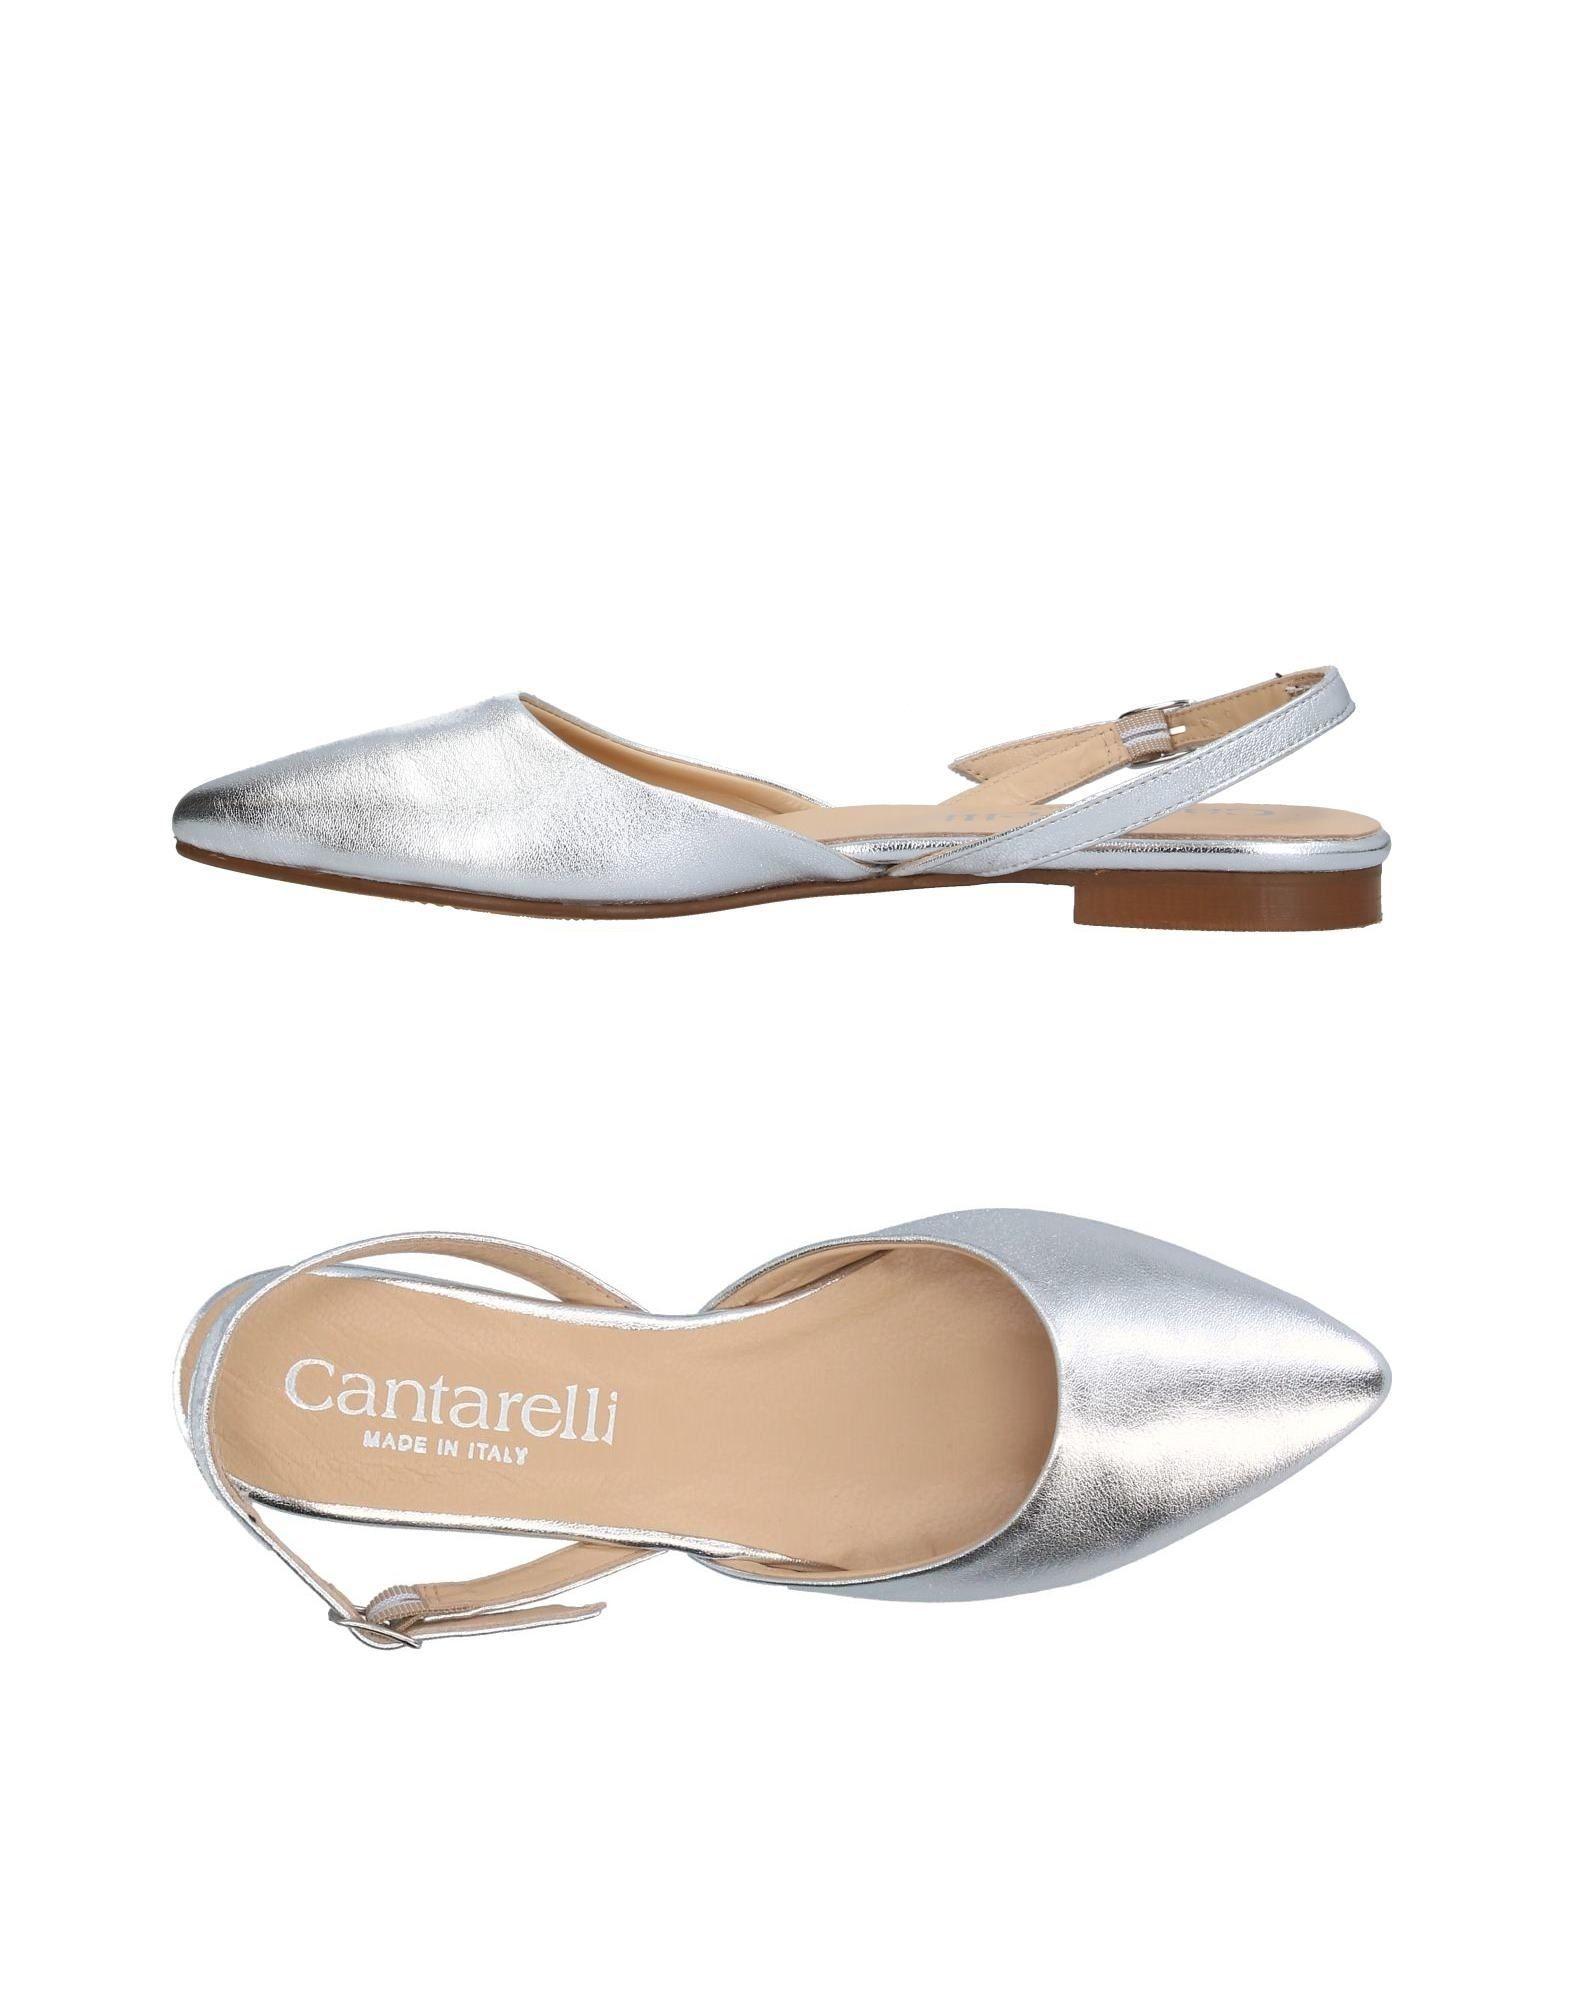 A buon mercato Ballerine Cantarelli Donna - 11377461CO